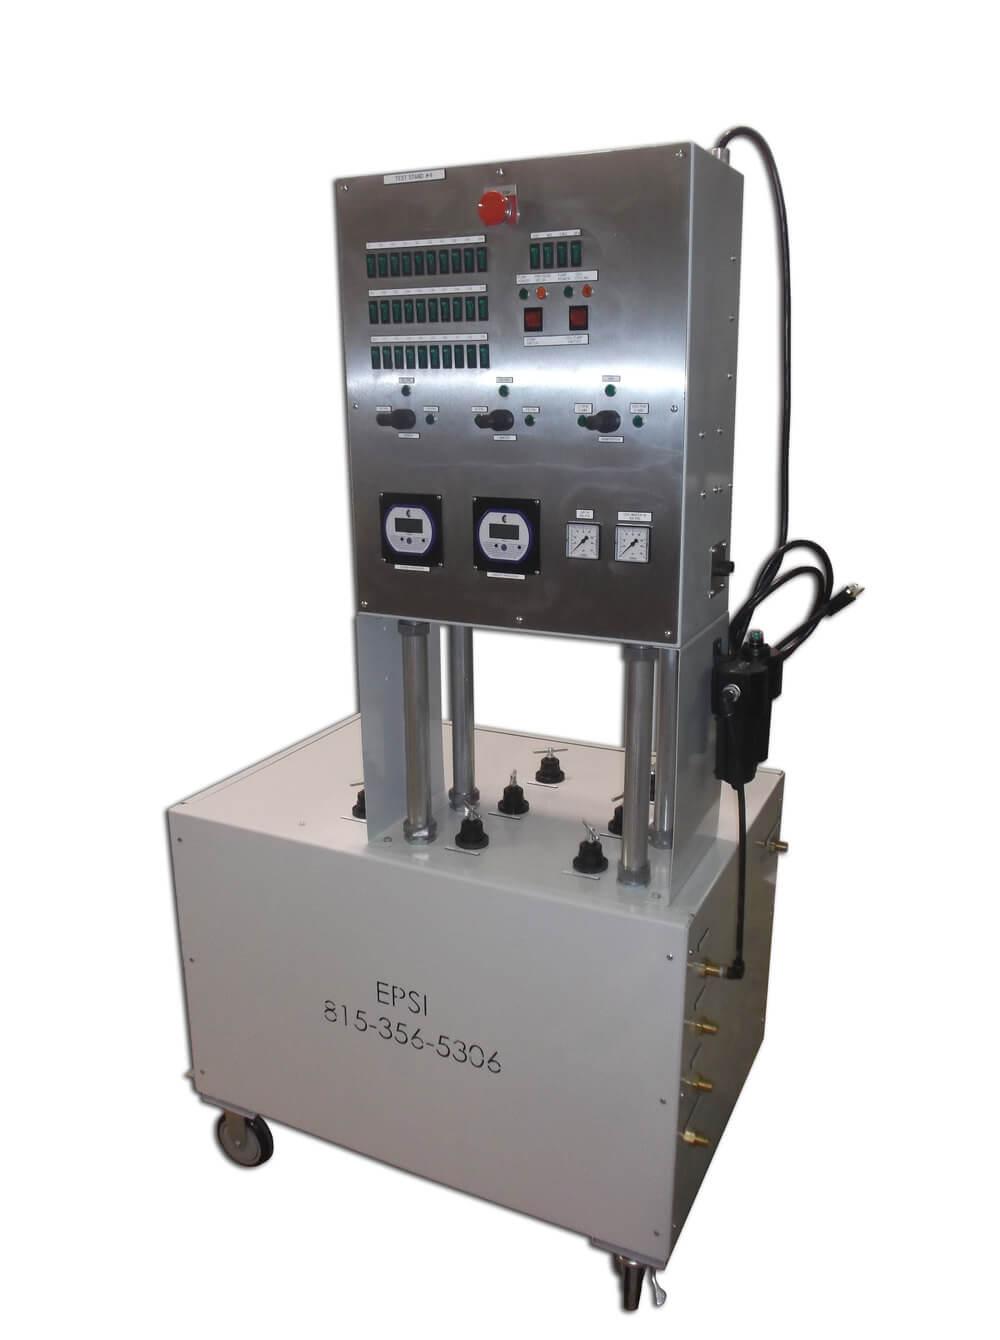 Production Test Equipment